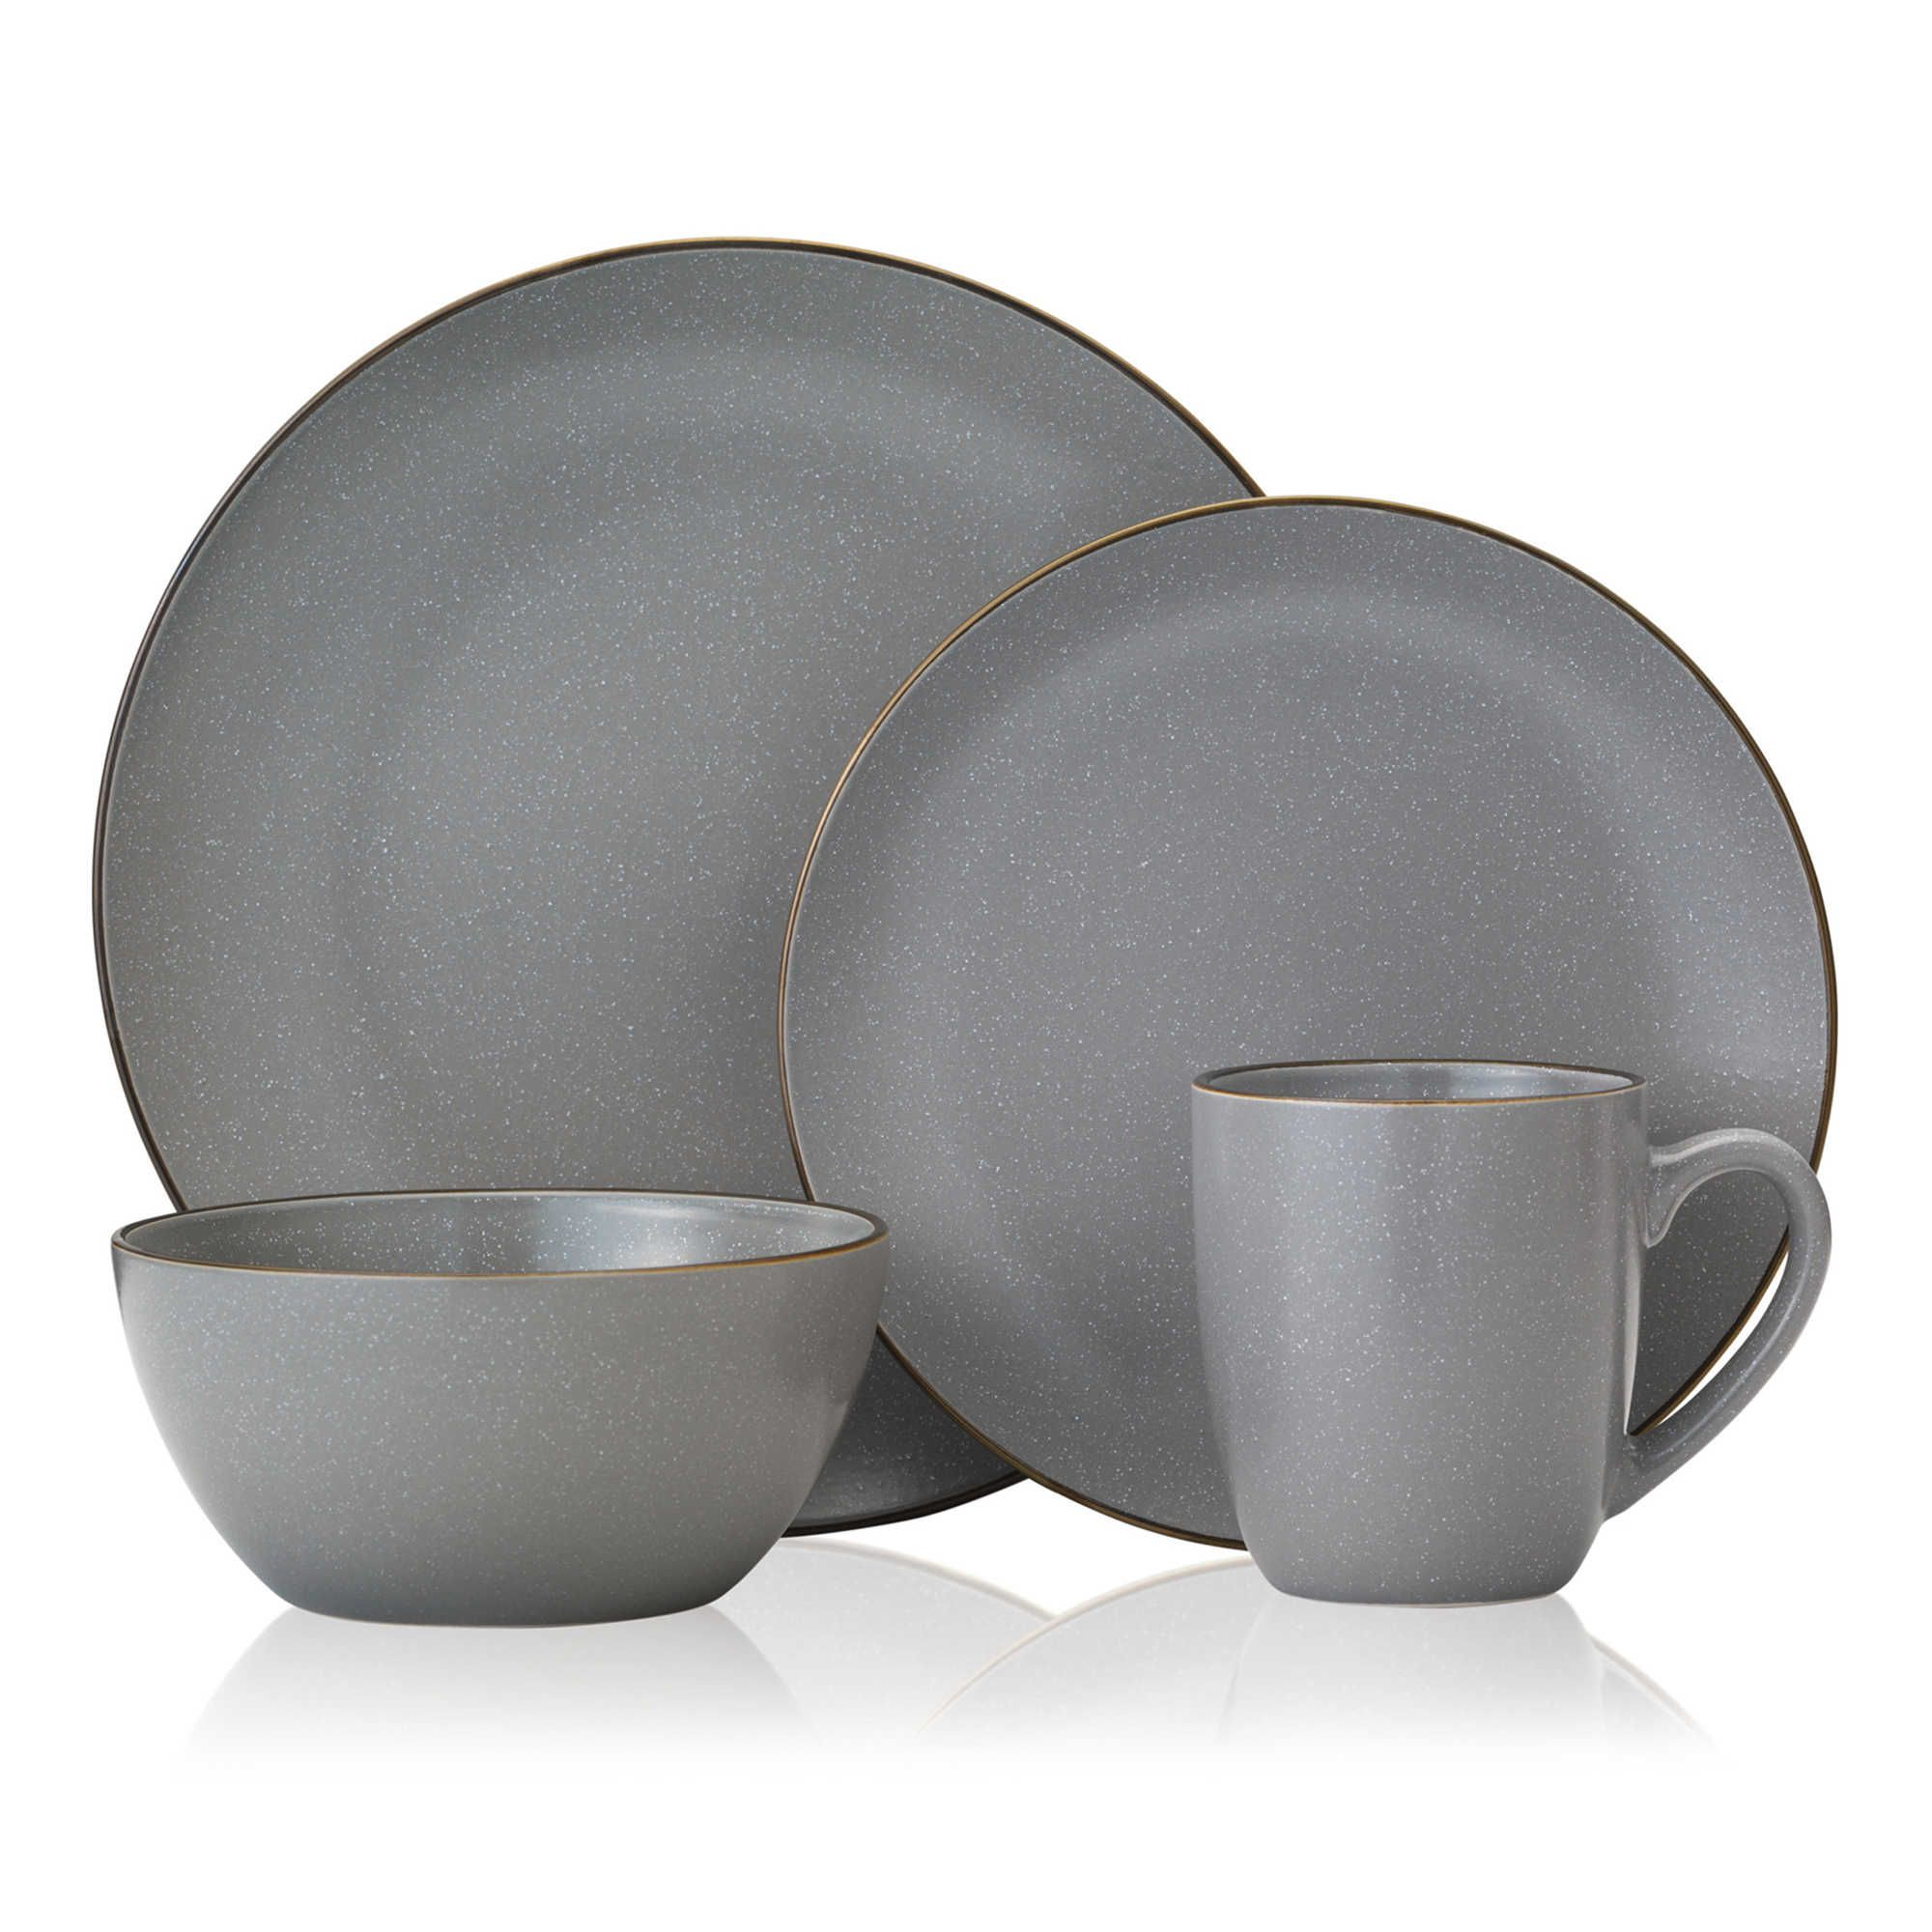 Gourmet Basics by Mikasa® Juliana 16-Piece Dinnerware Set in Blue  sc 1 st  Pinterest & Gourmet Basics by Mikasa® Juliana 16-Piece Dinnerware Set in Blue ...